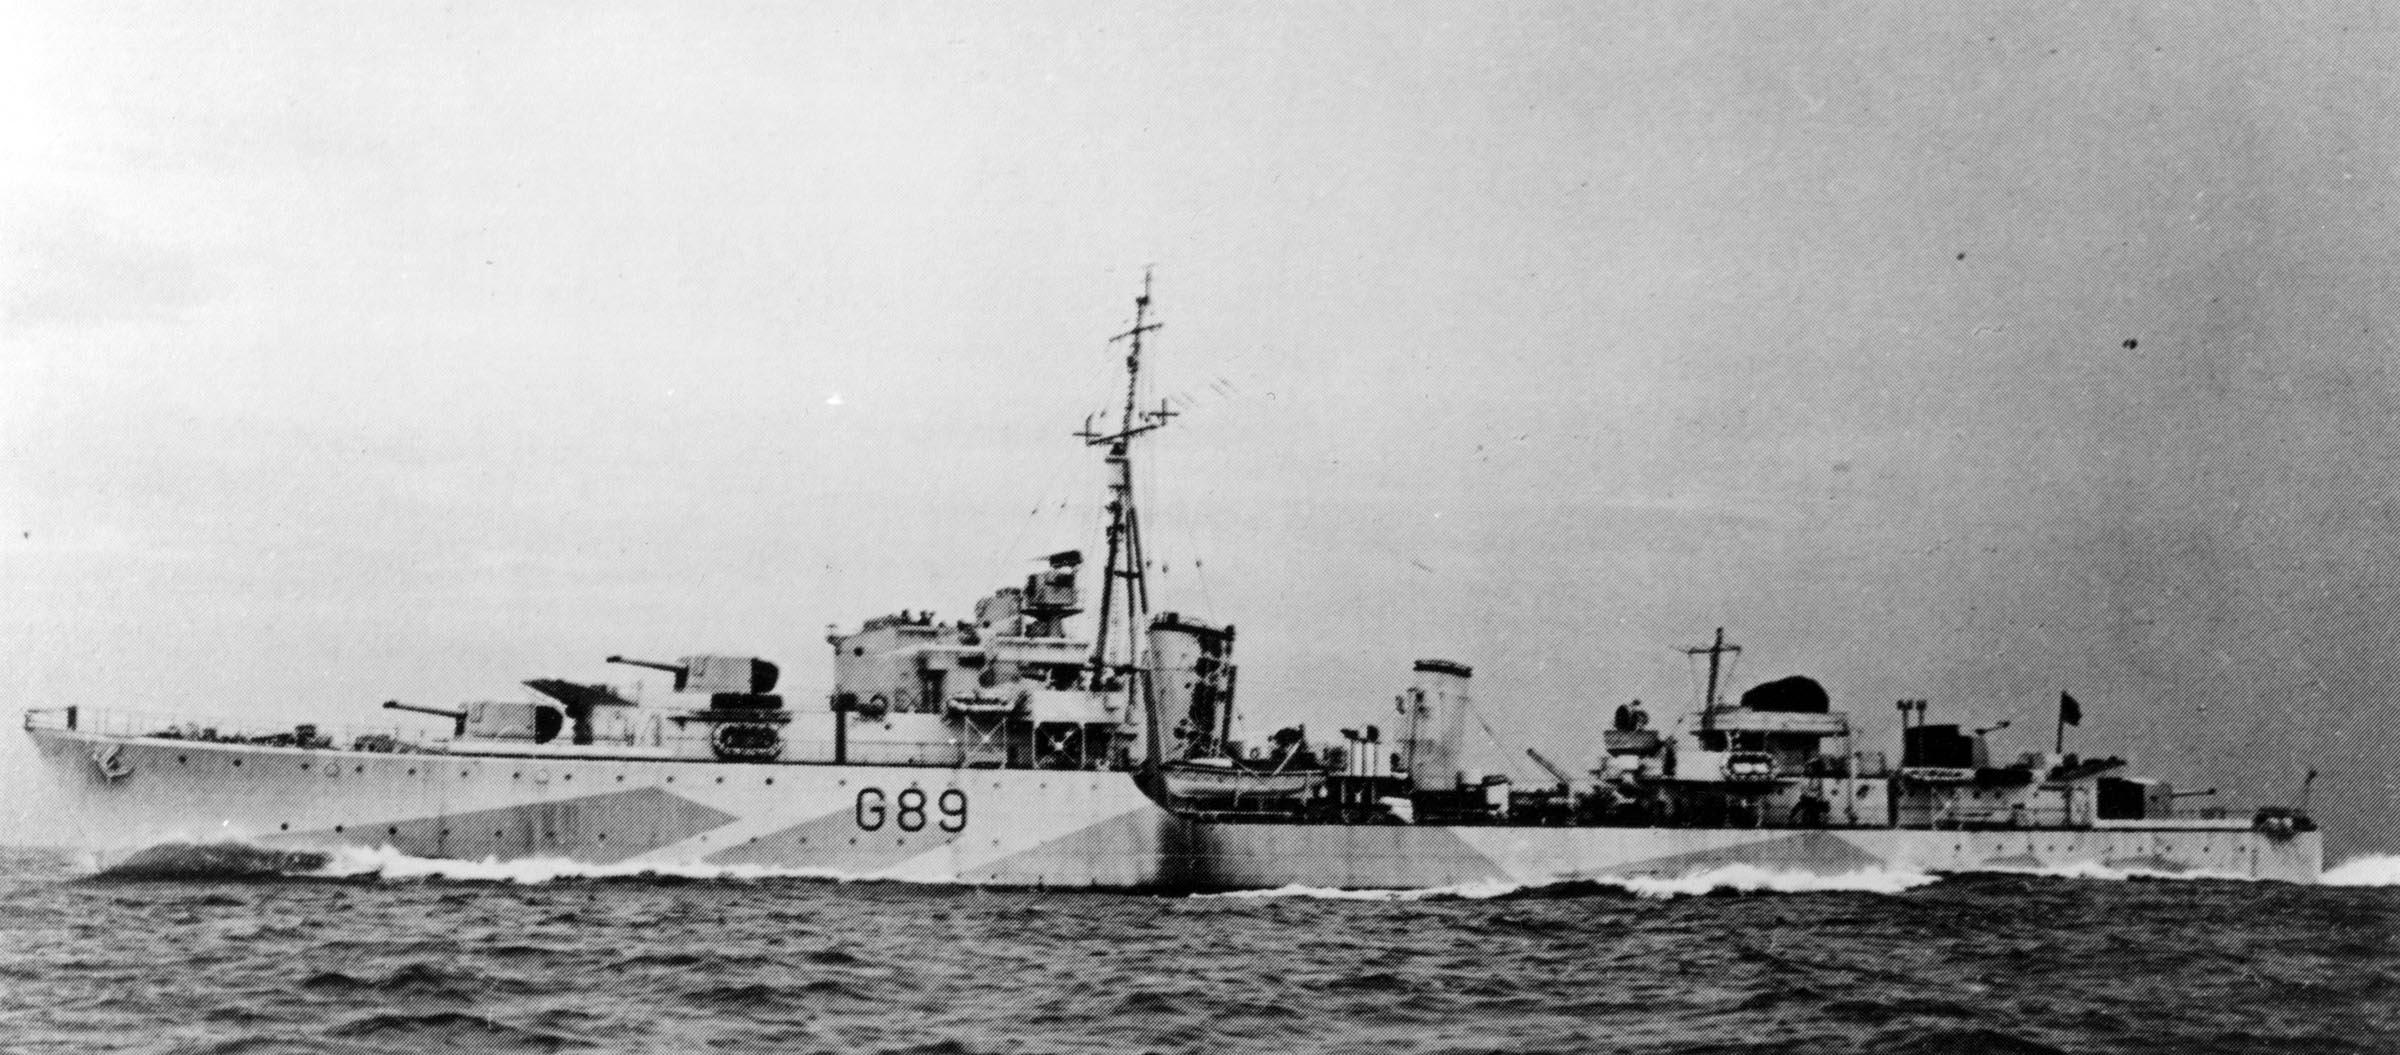 HMCS IROQUOIS (1st)